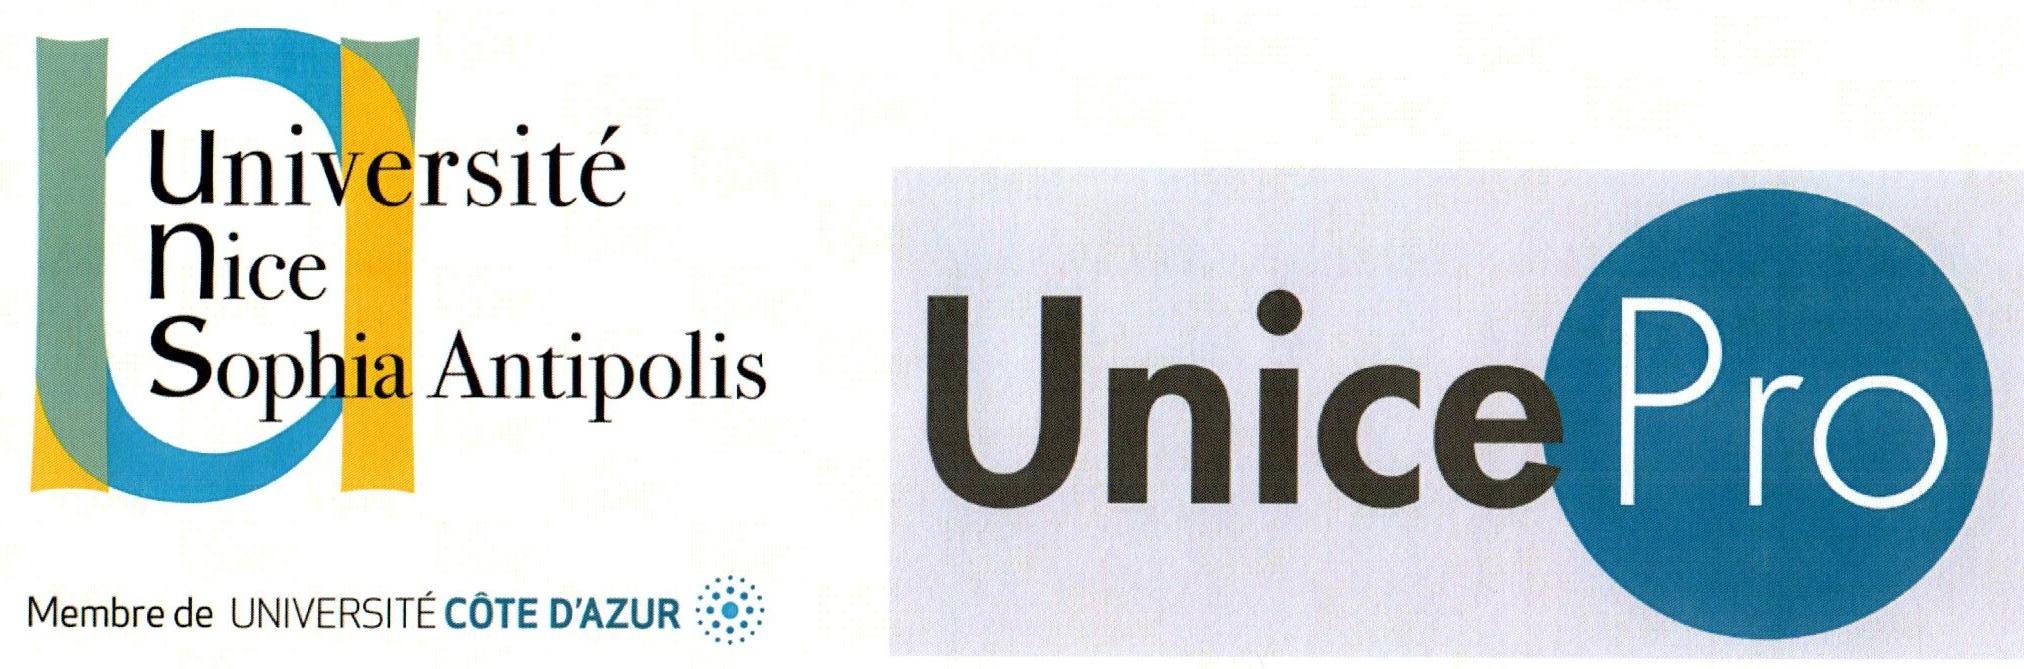 logos UNS ET UNICEPRO